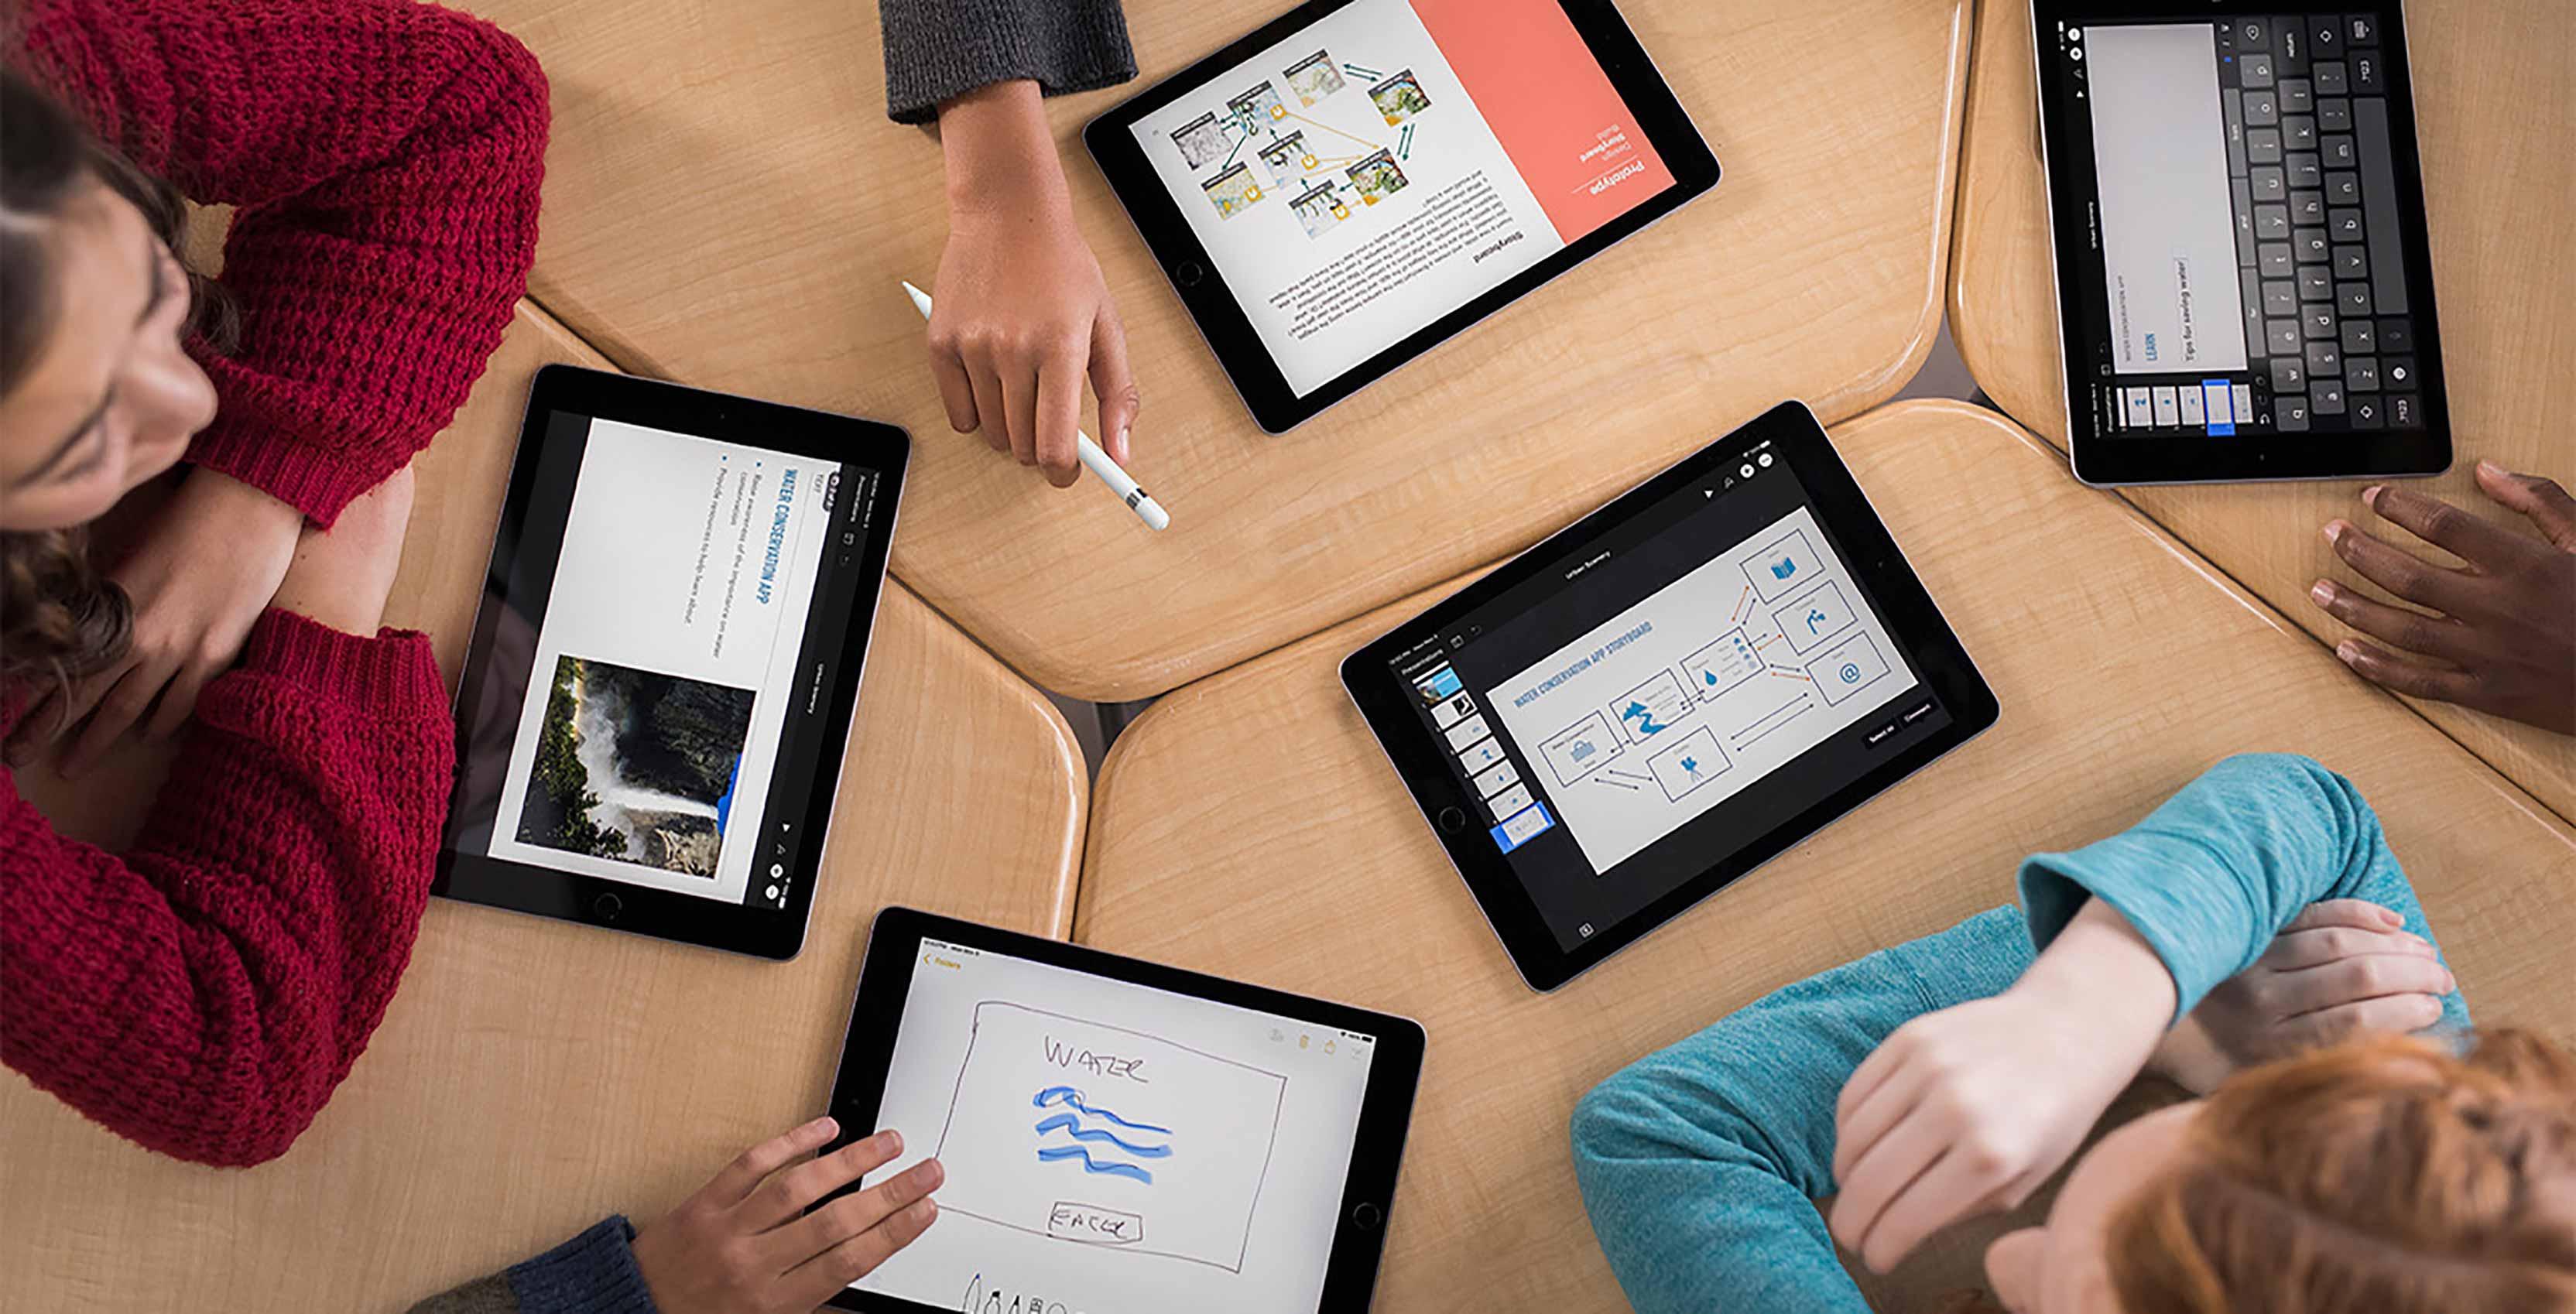 Apple computer science